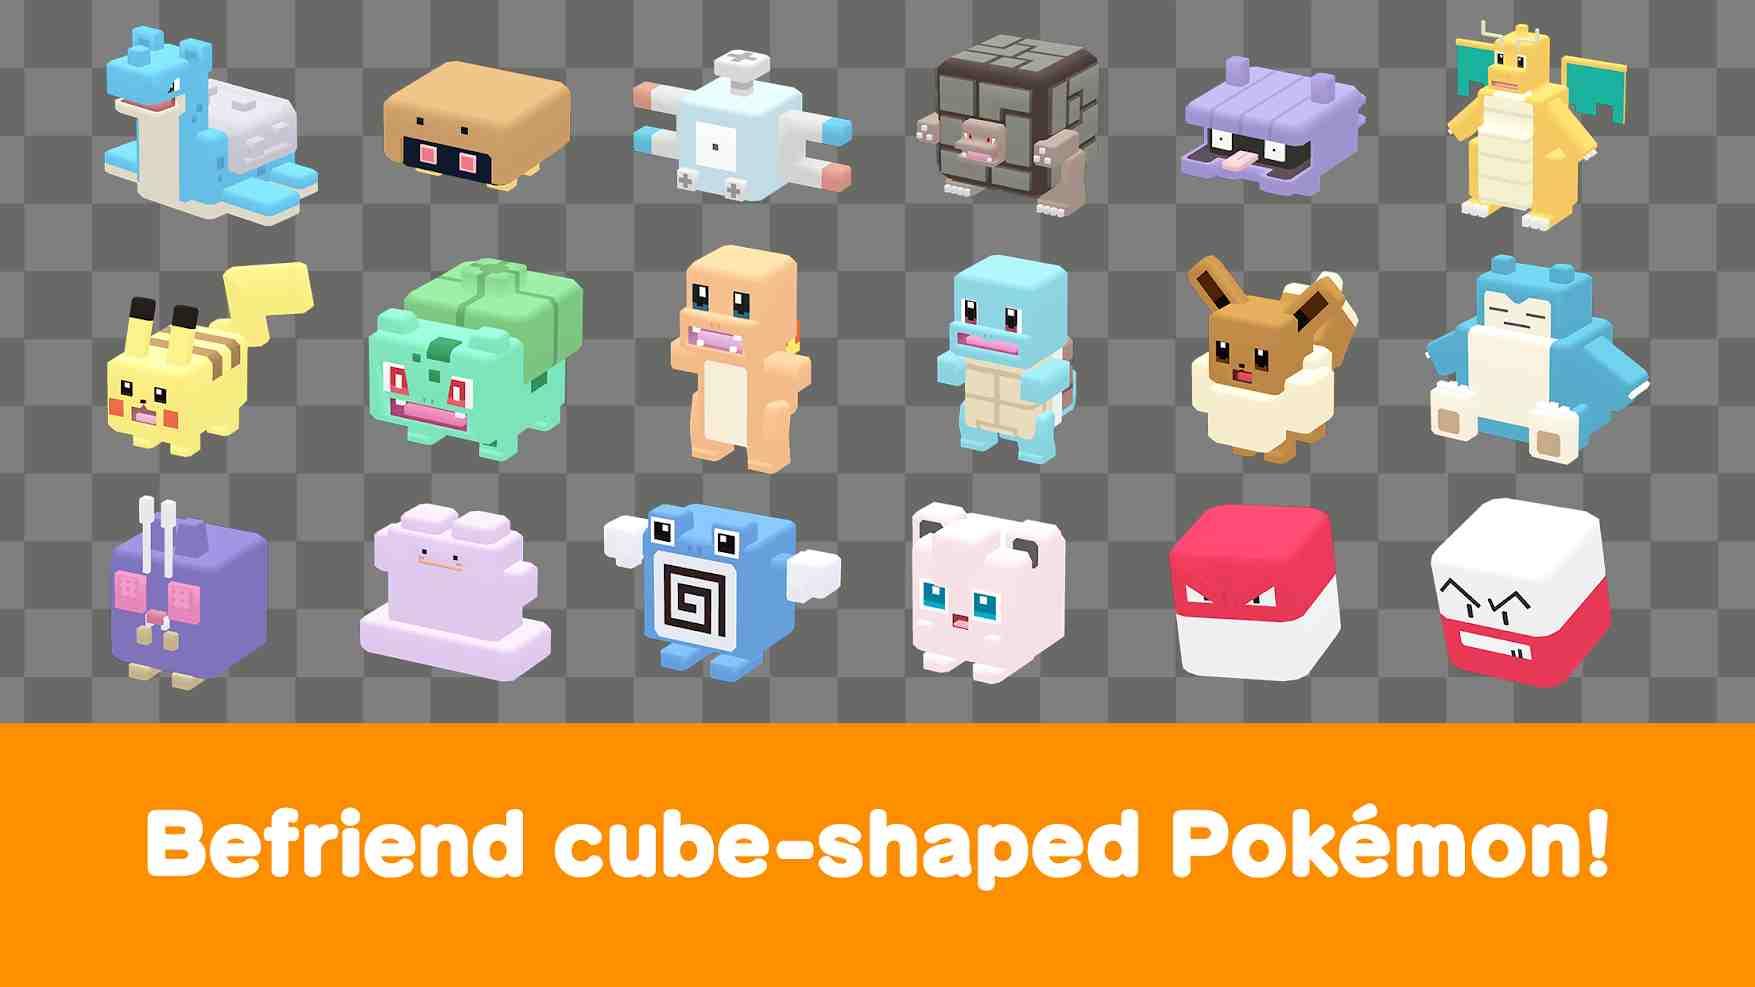 tai game Pokémon Quest mod apk